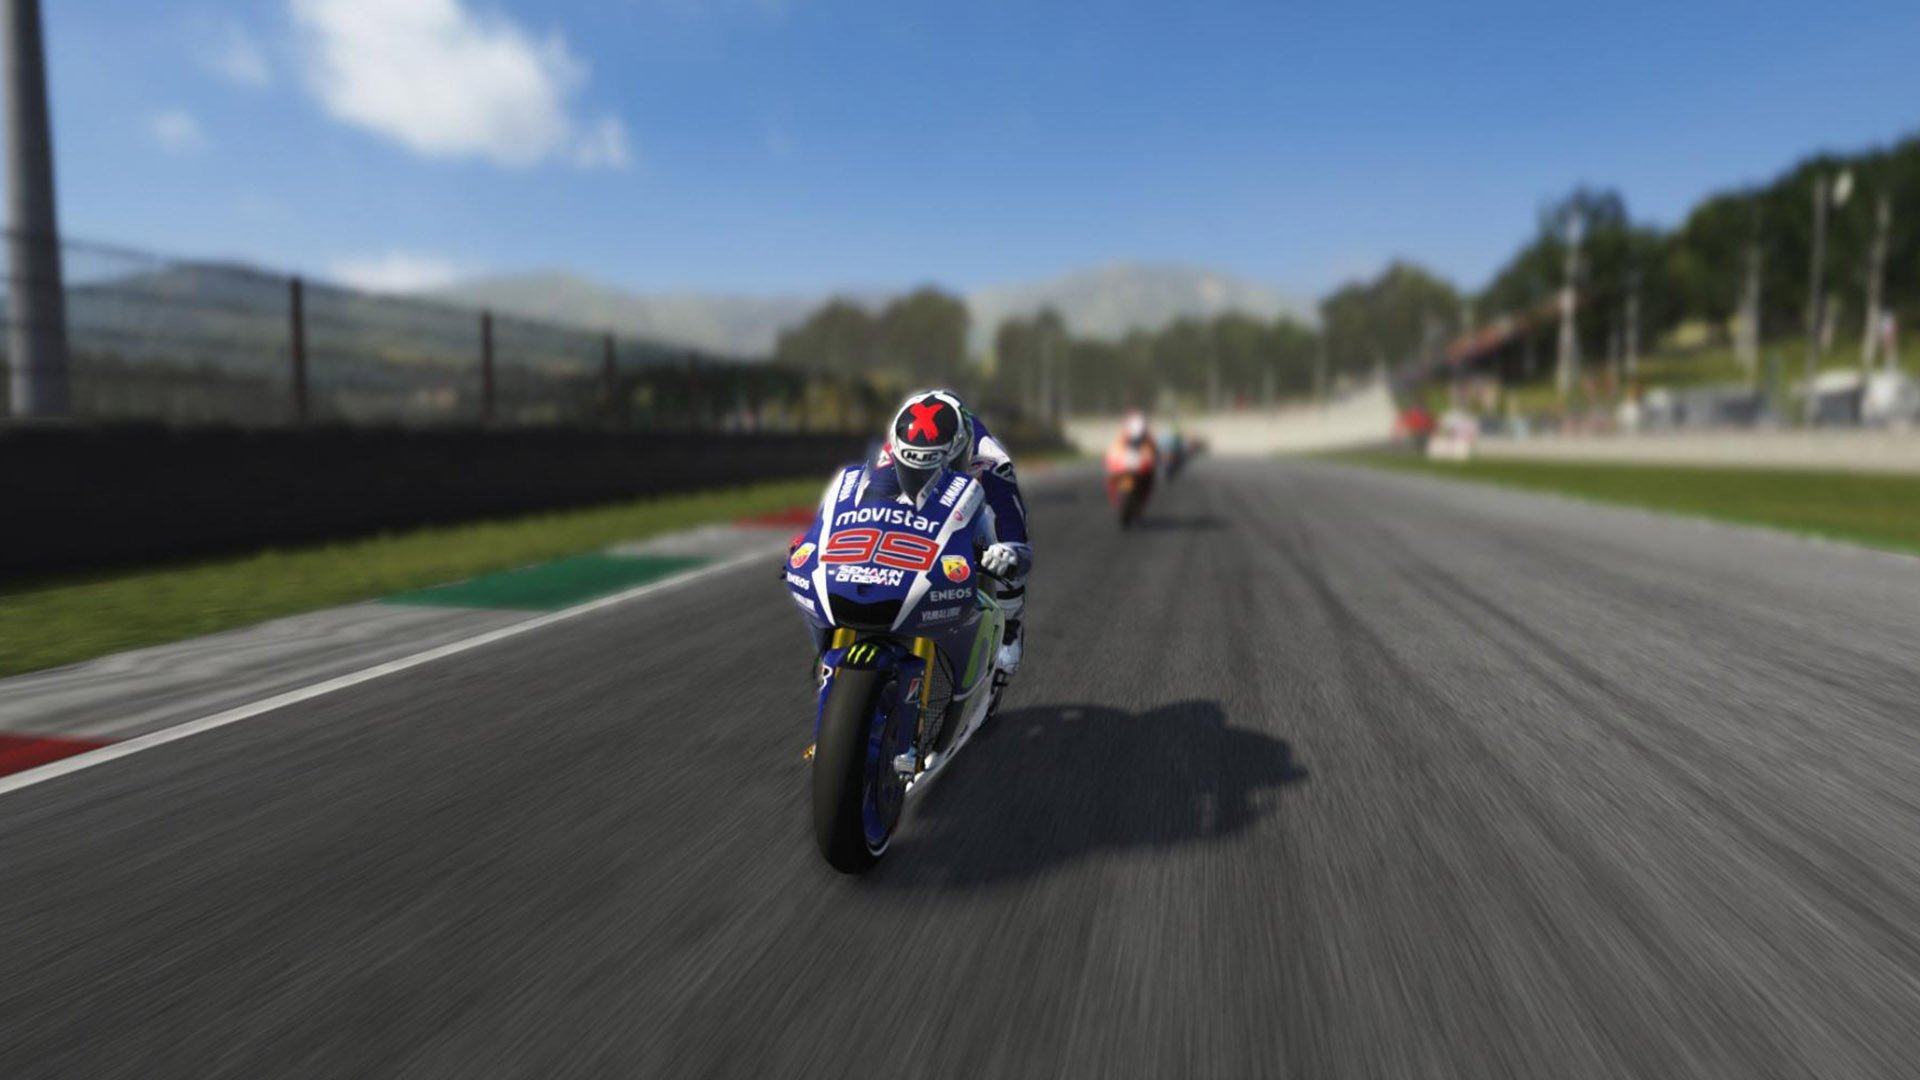 Motogp Juego Ps4   MotoGP 2017 Info, Video, Points Table